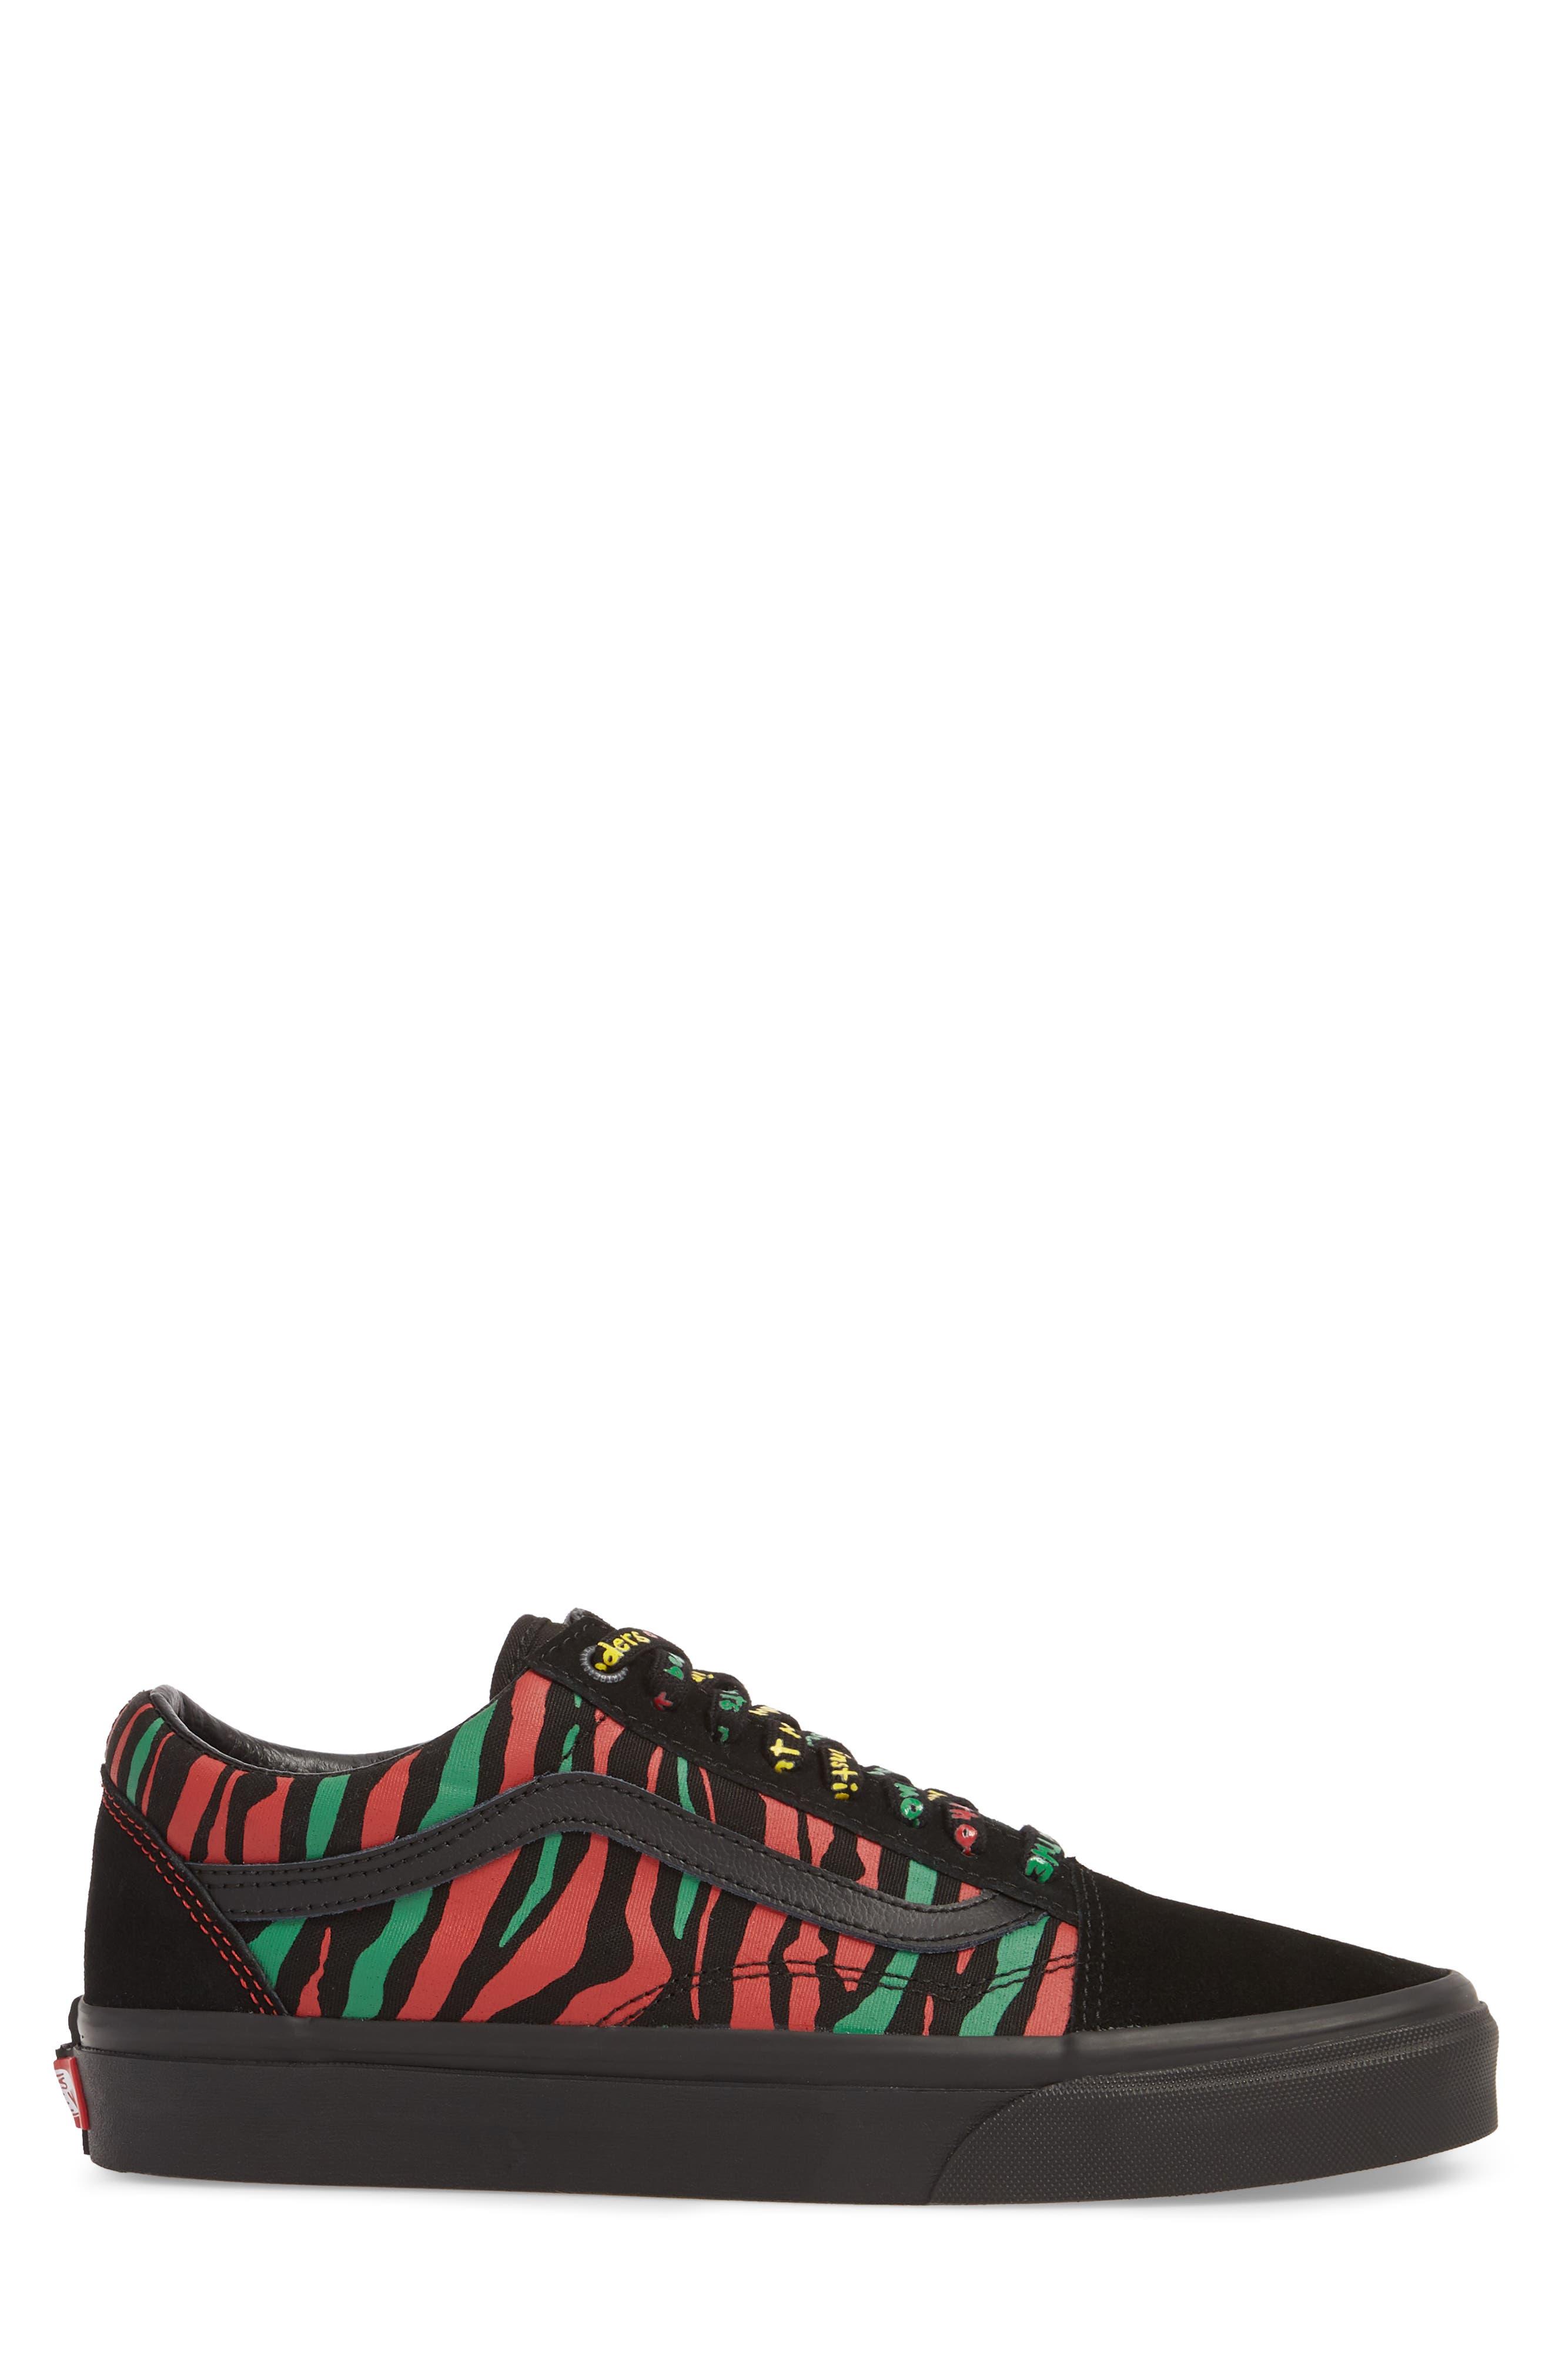 ATCQ Old Skool Sneaker,                             Alternate thumbnail 3, color,                             Black Leather